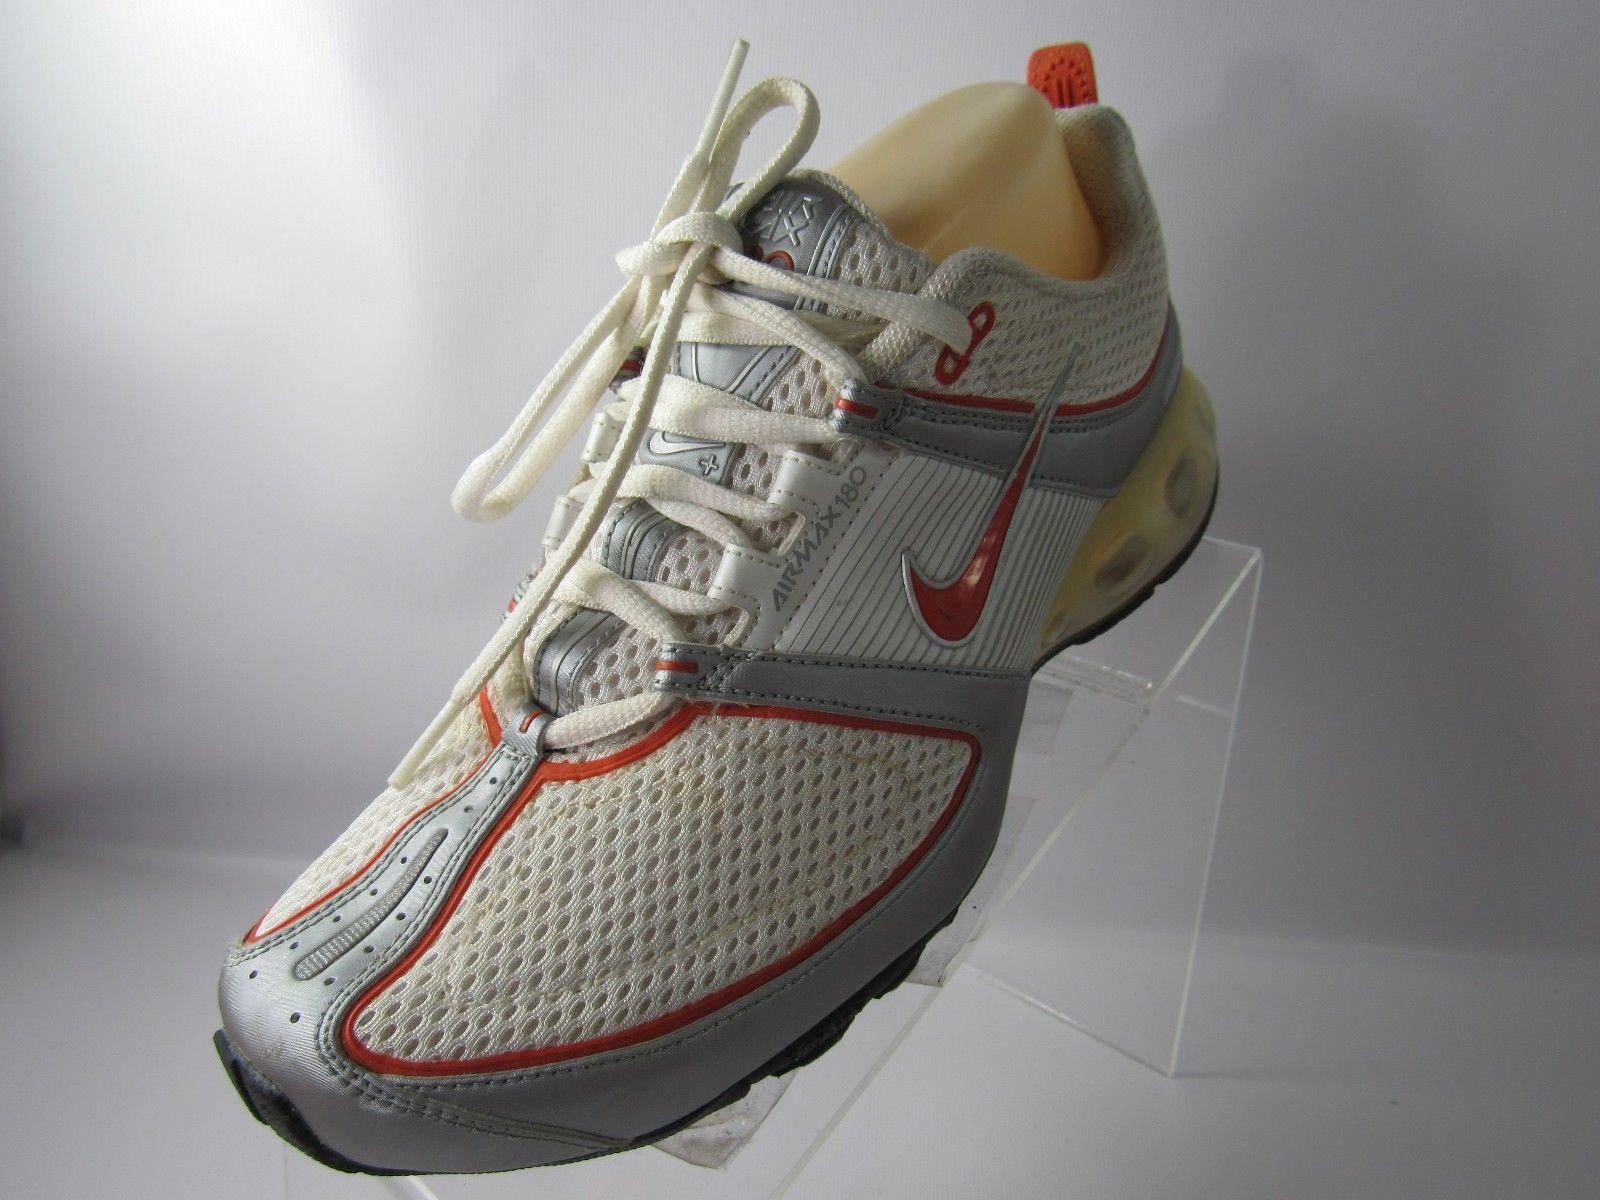 fdc444760f9 Nike Air Max 180 314017-181 Sz 8 M Orange and 50 similar items